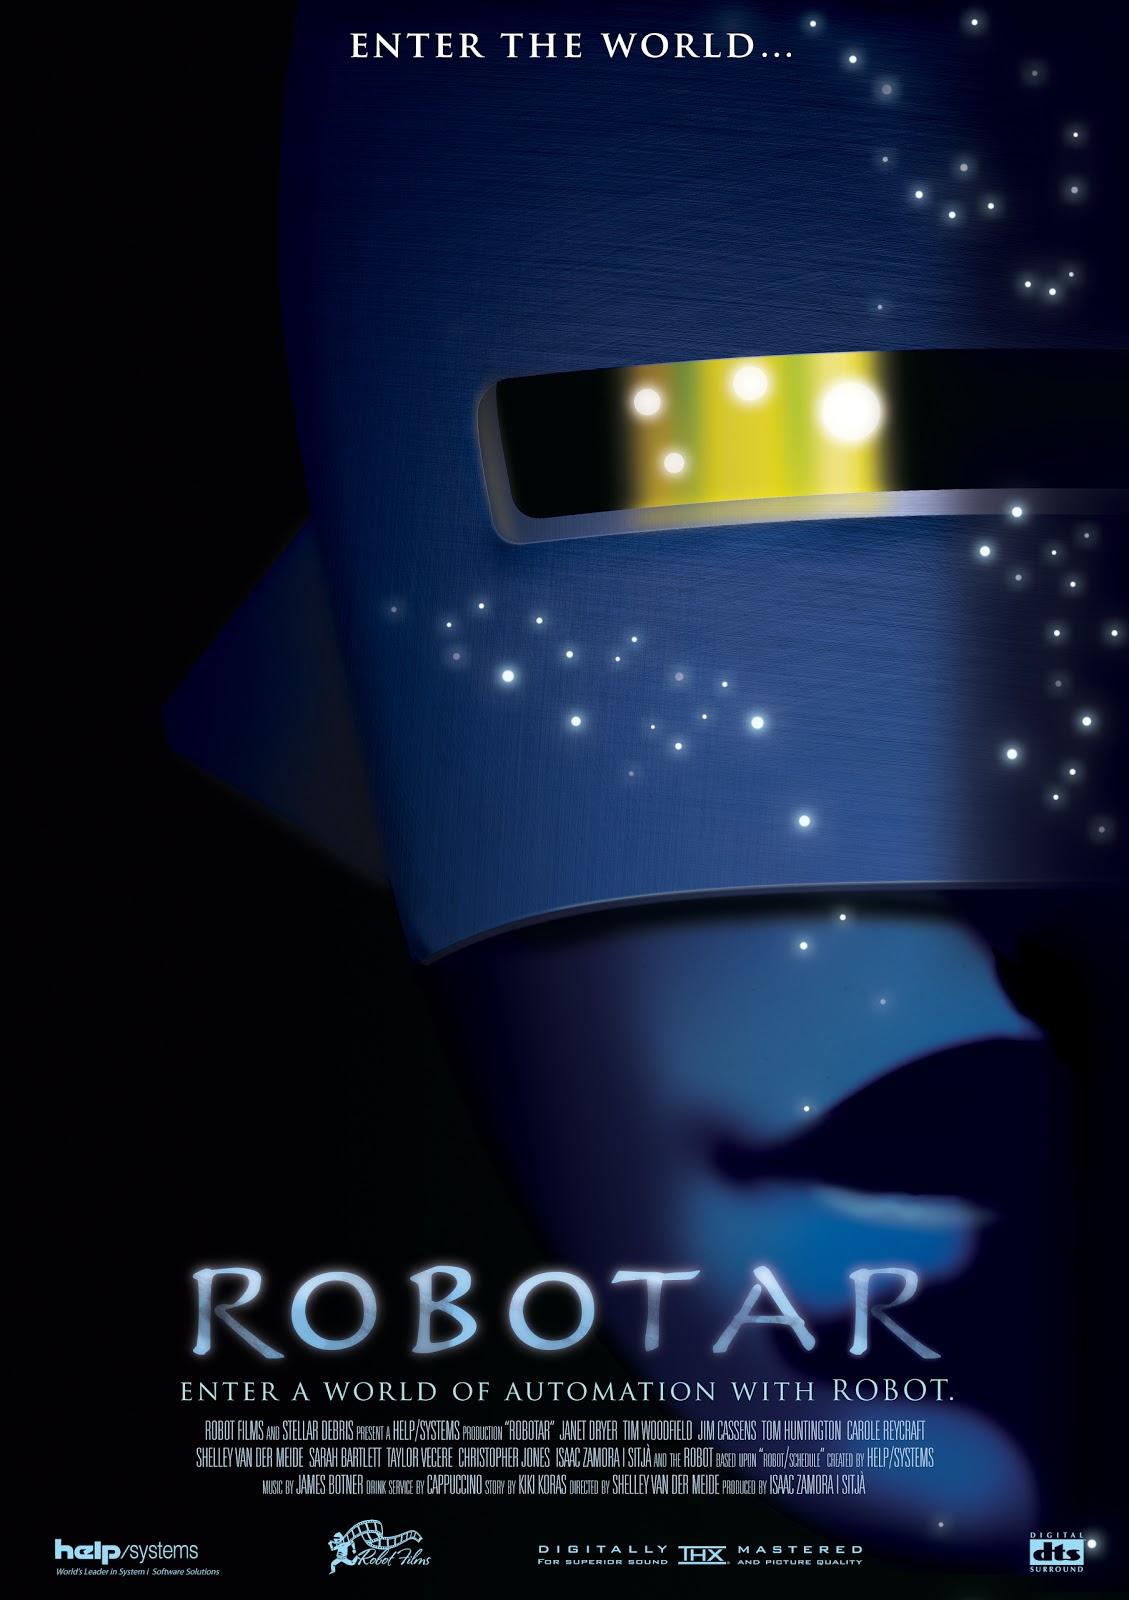 tobuushi_illustrationsblog: Help/Systems Robot mascot calendar